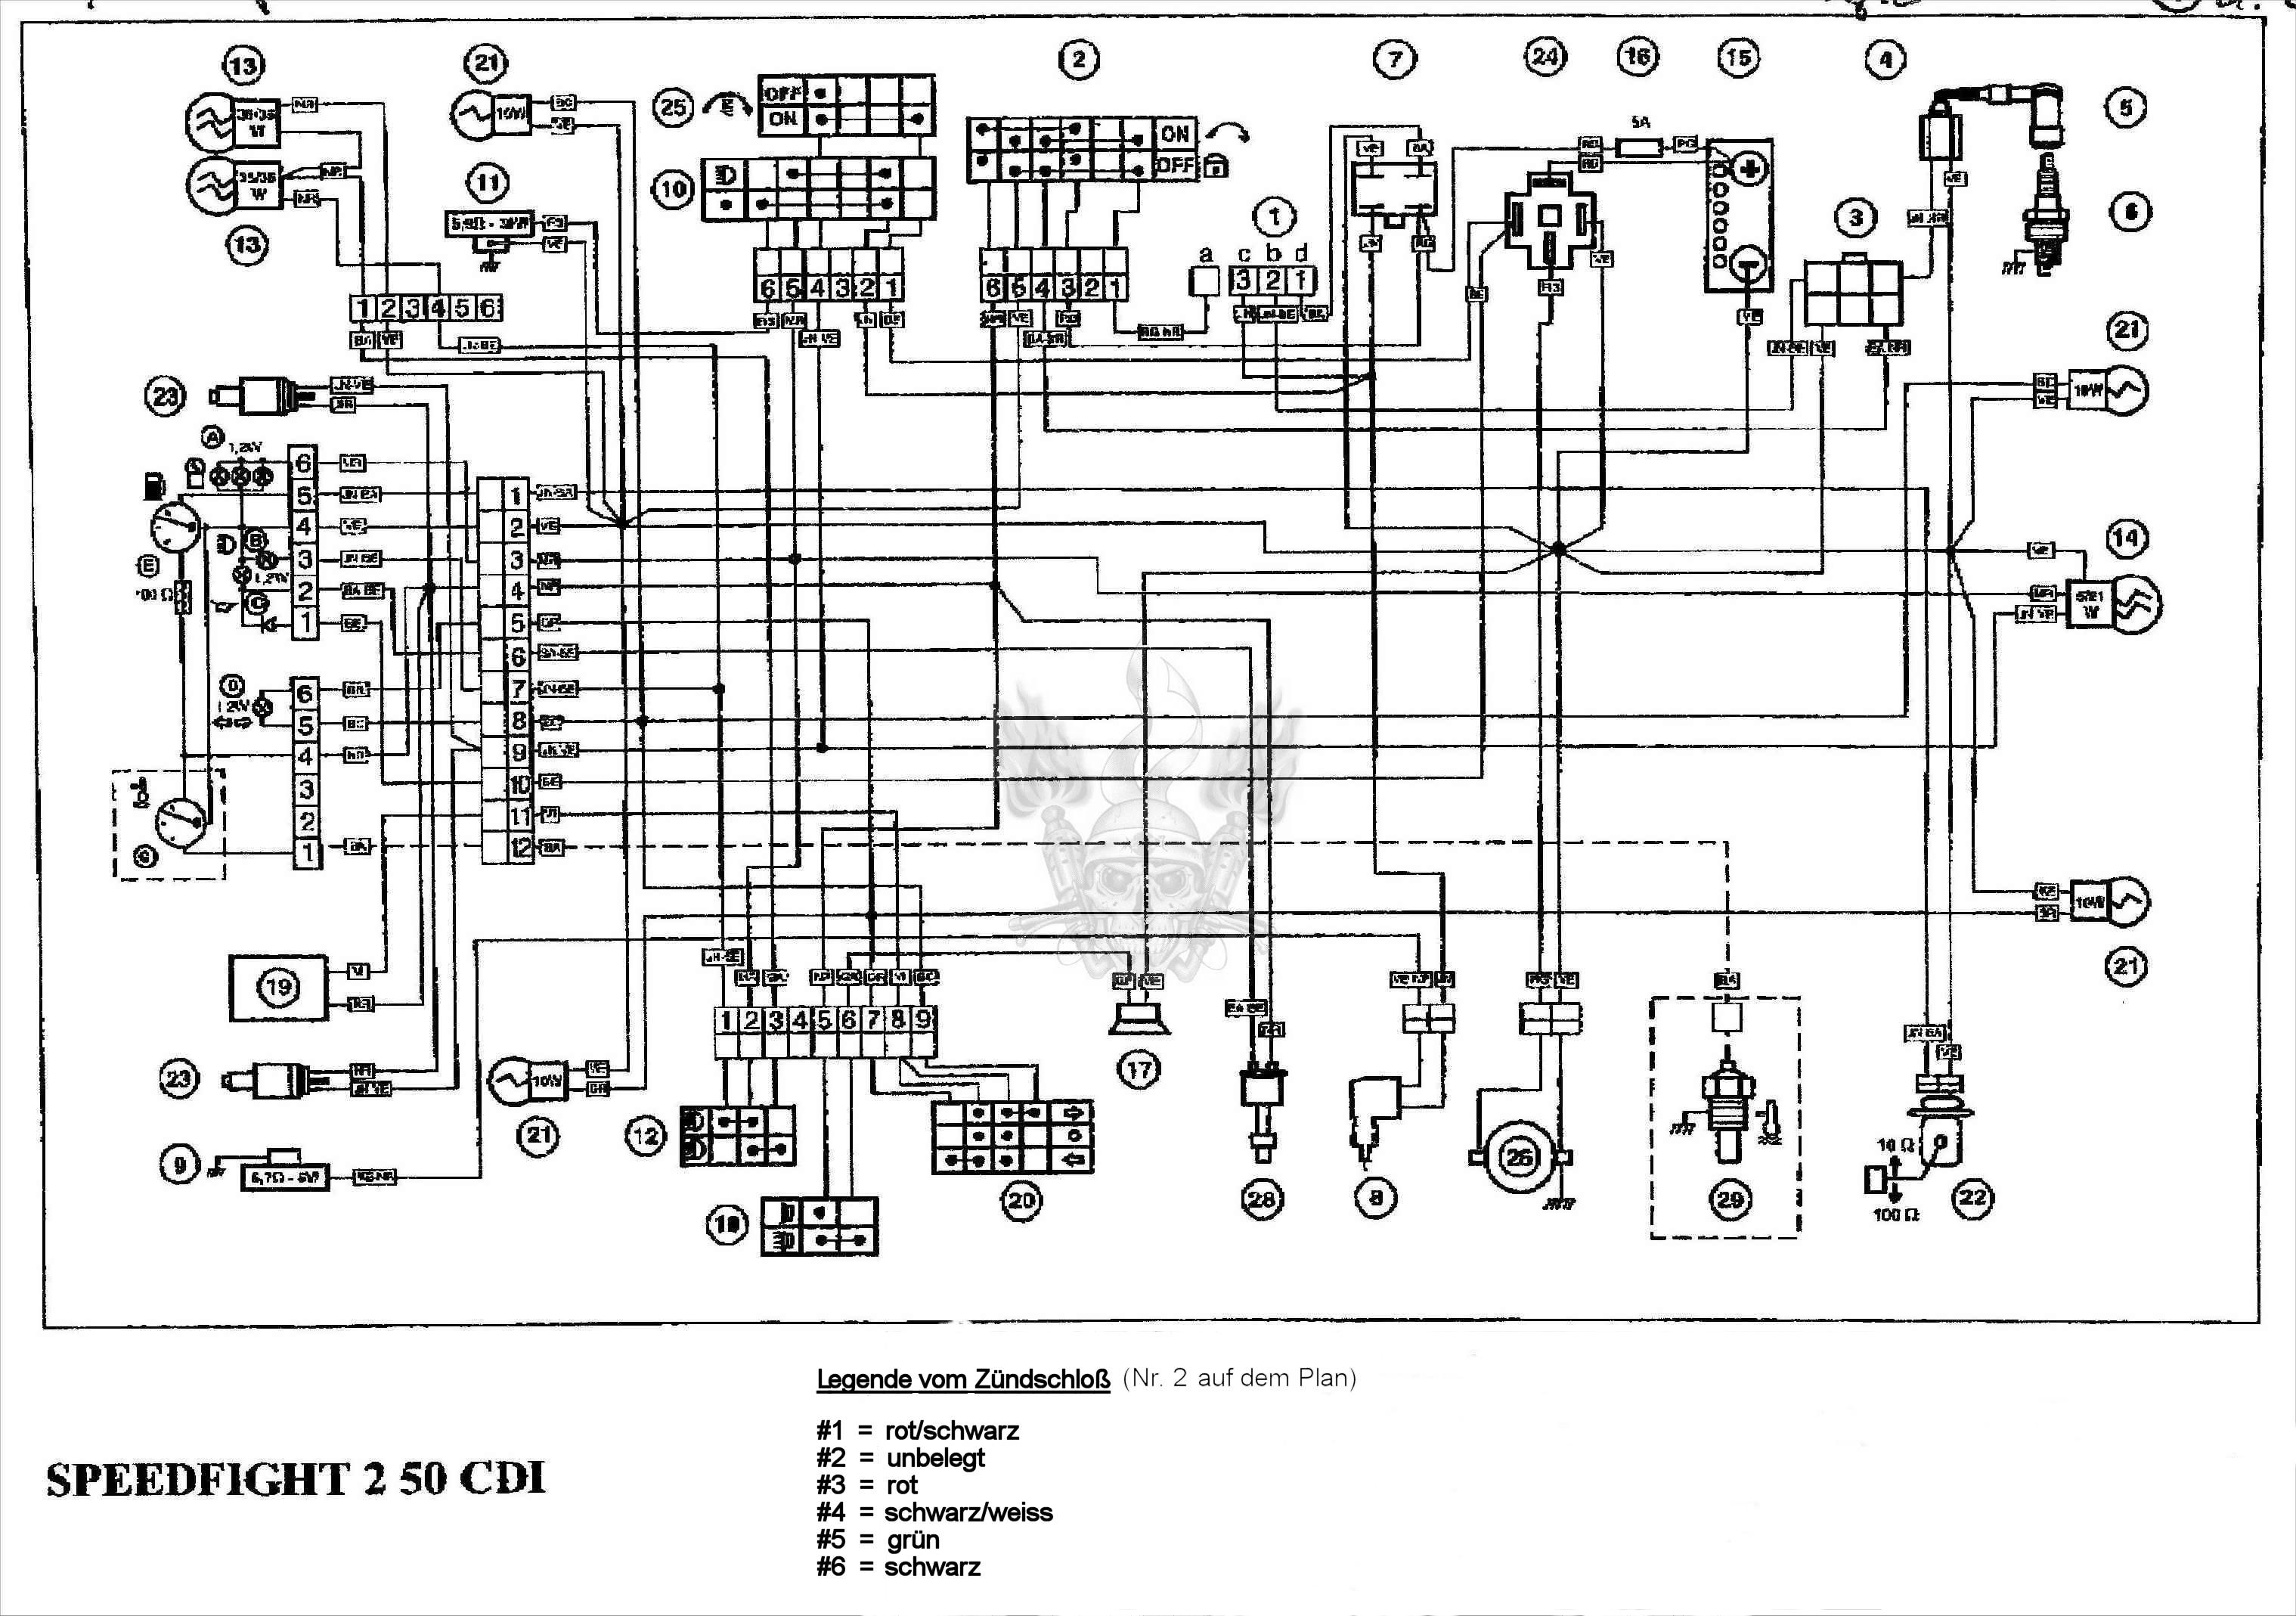 peugeot speedfight wiring library of wiring diagram u2022 rh jessascott co